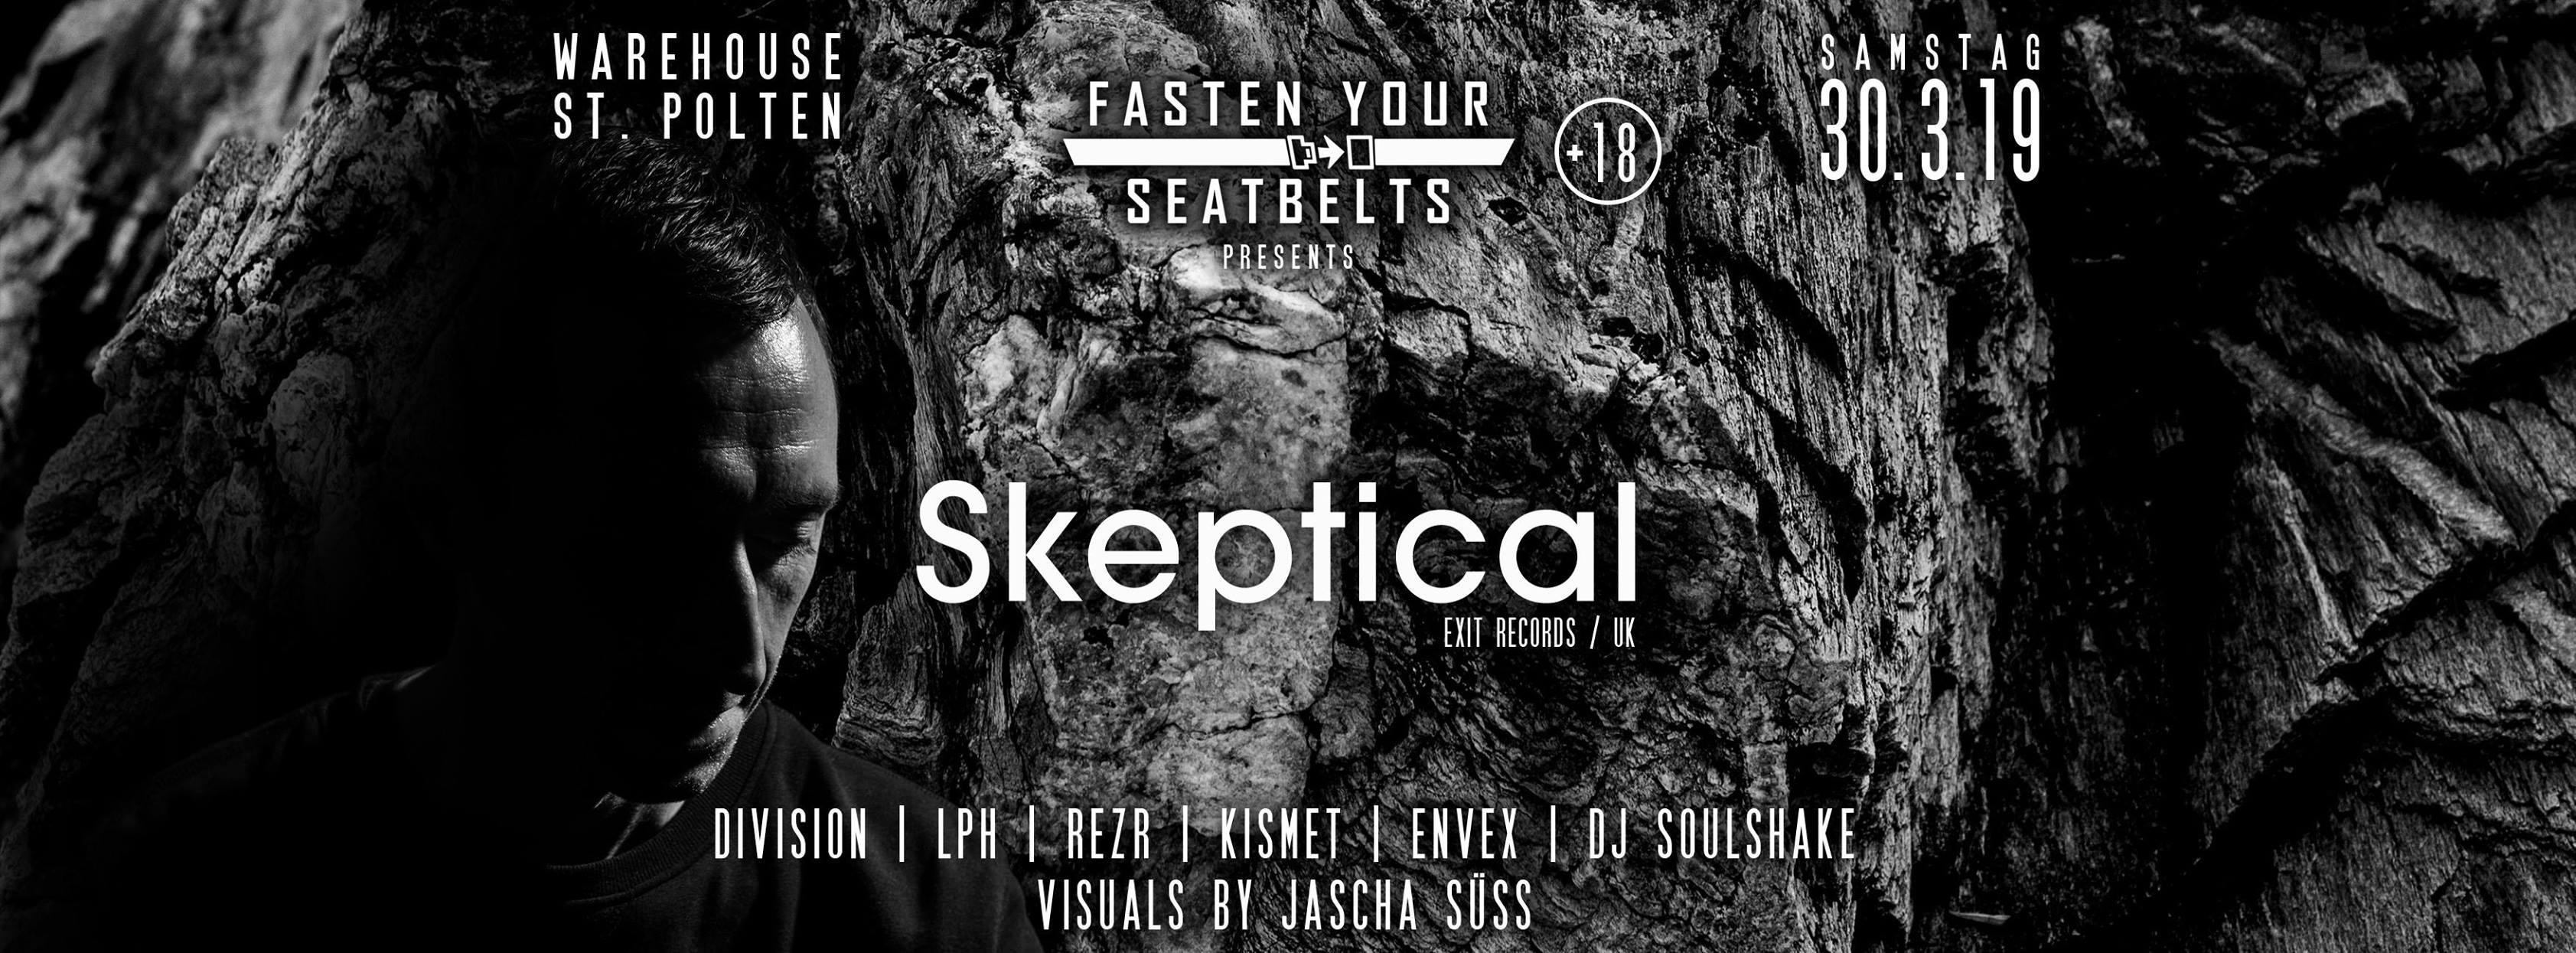 Fasten Your Seatbelts w/ Skeptical